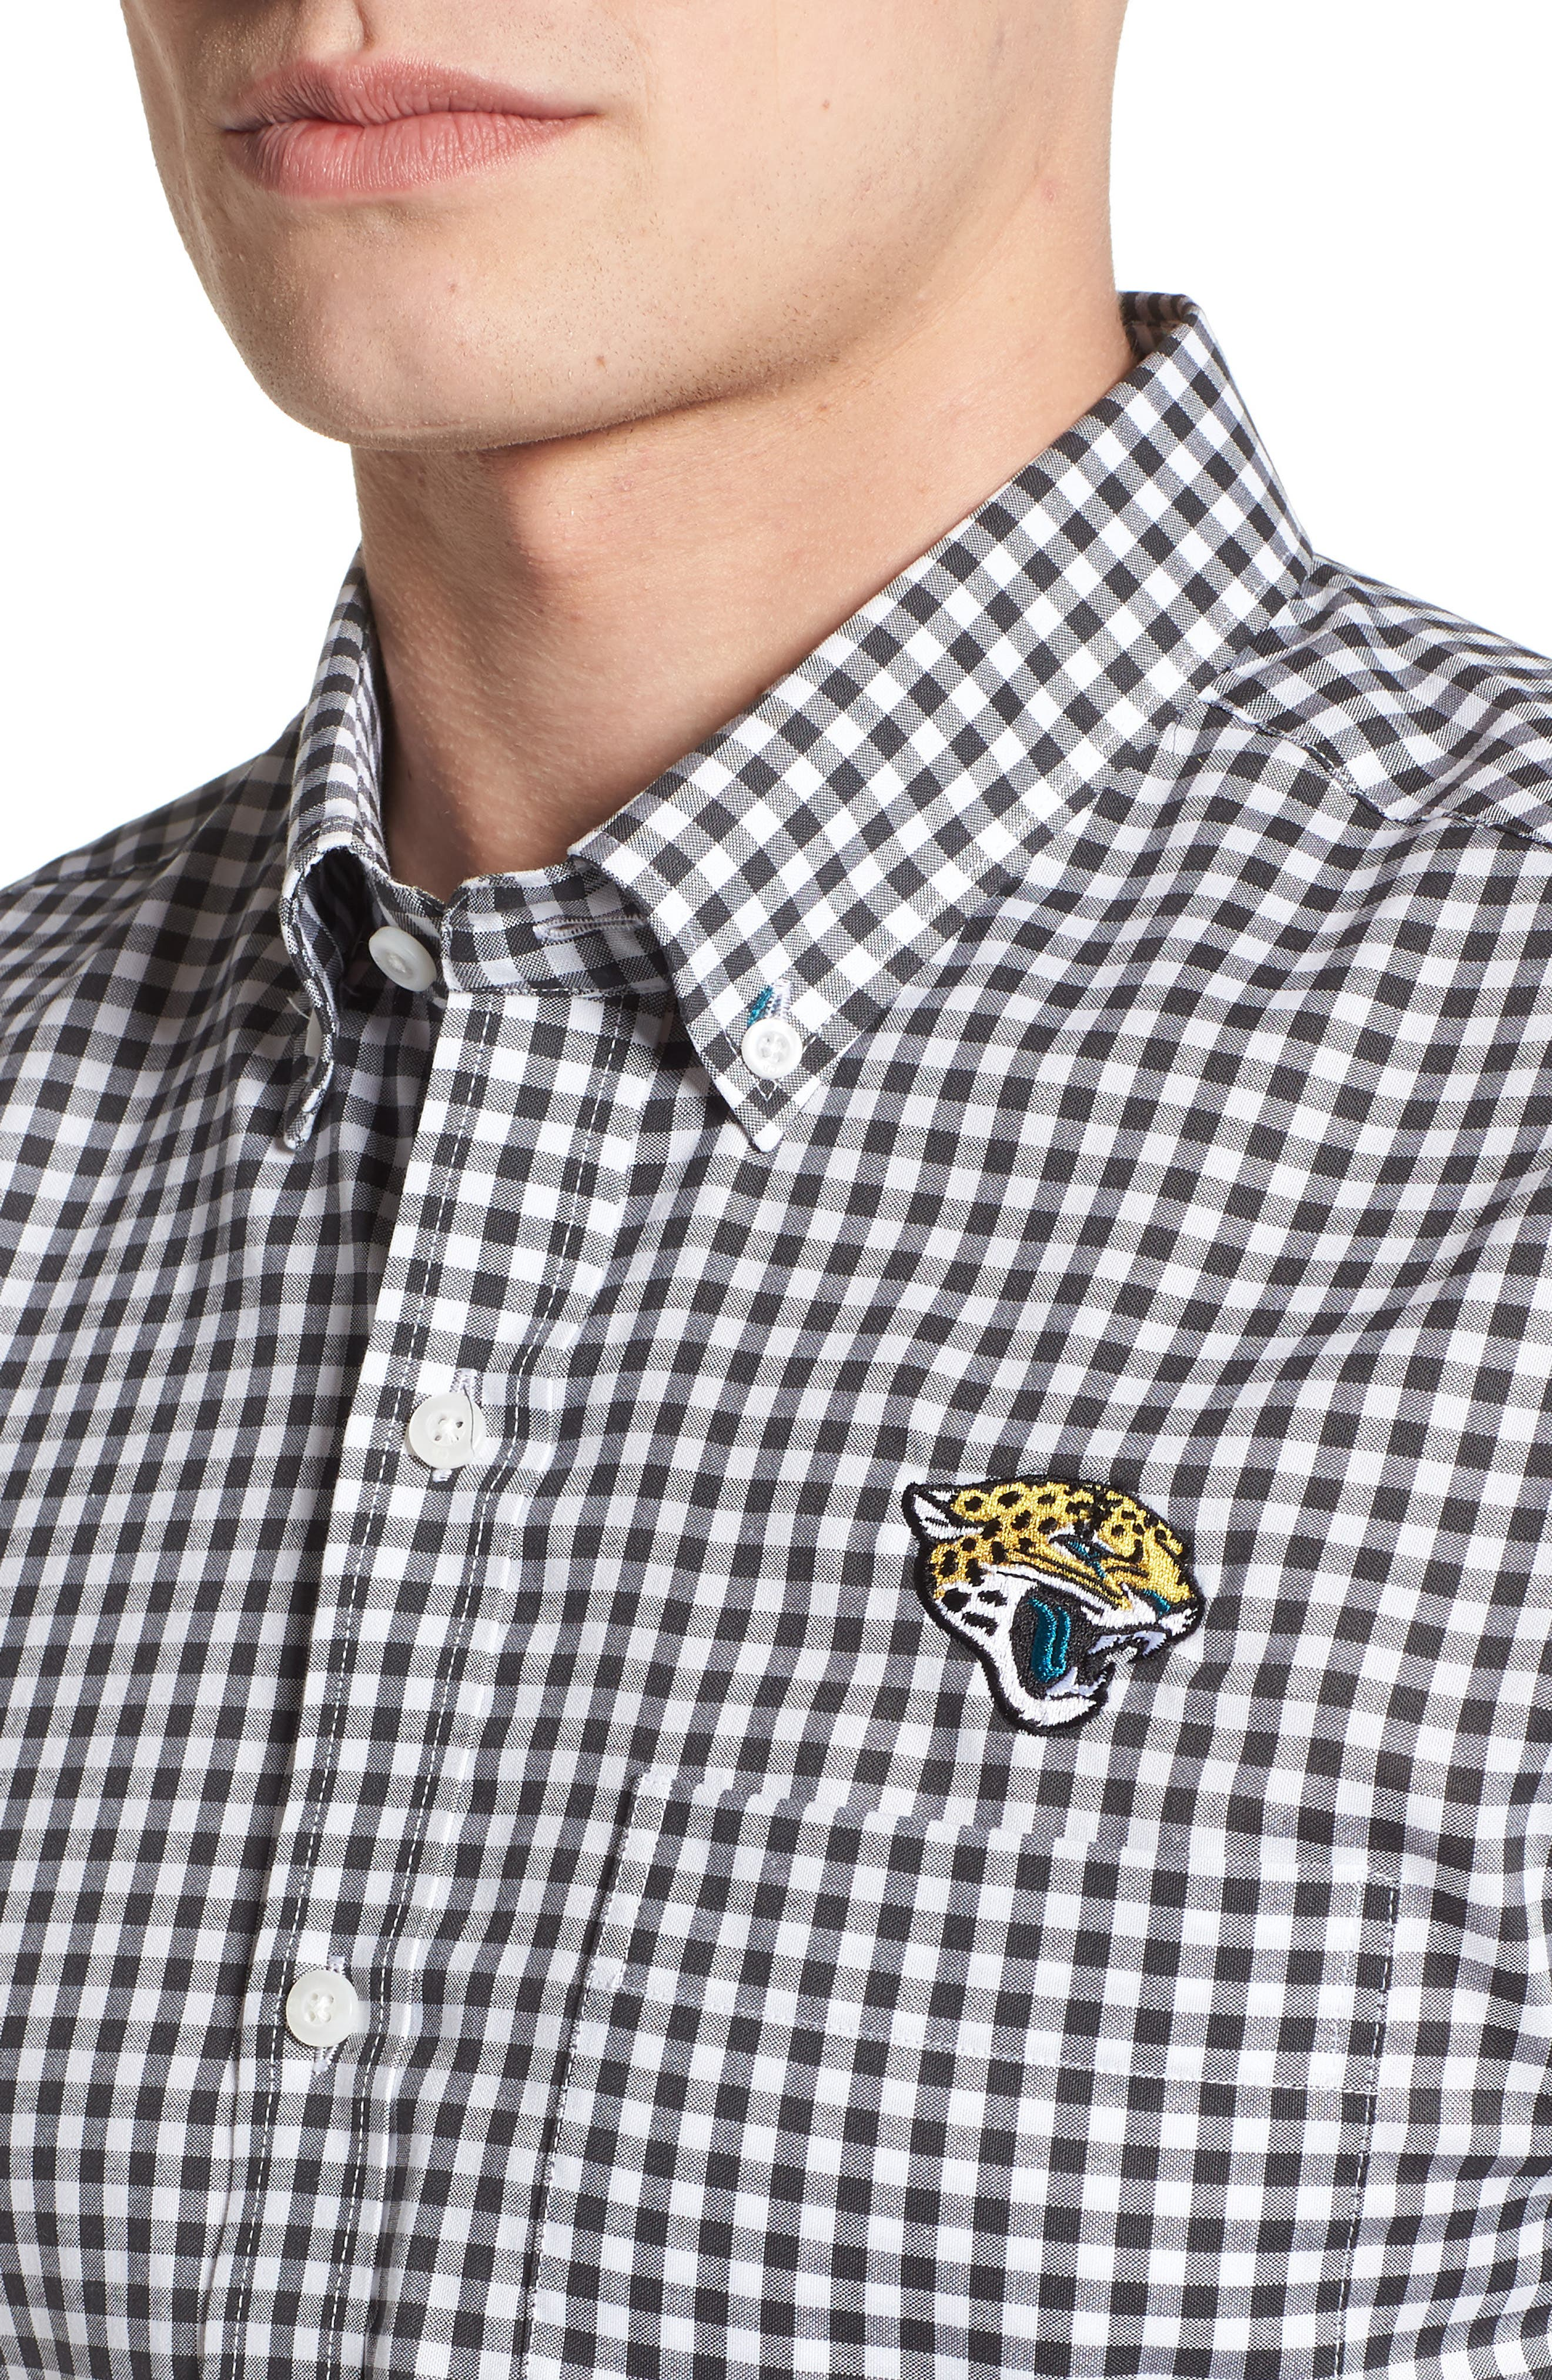 League Jacksonville Jaguars Regular Fit Shirt,                             Alternate thumbnail 4, color,                             CHARCOAL